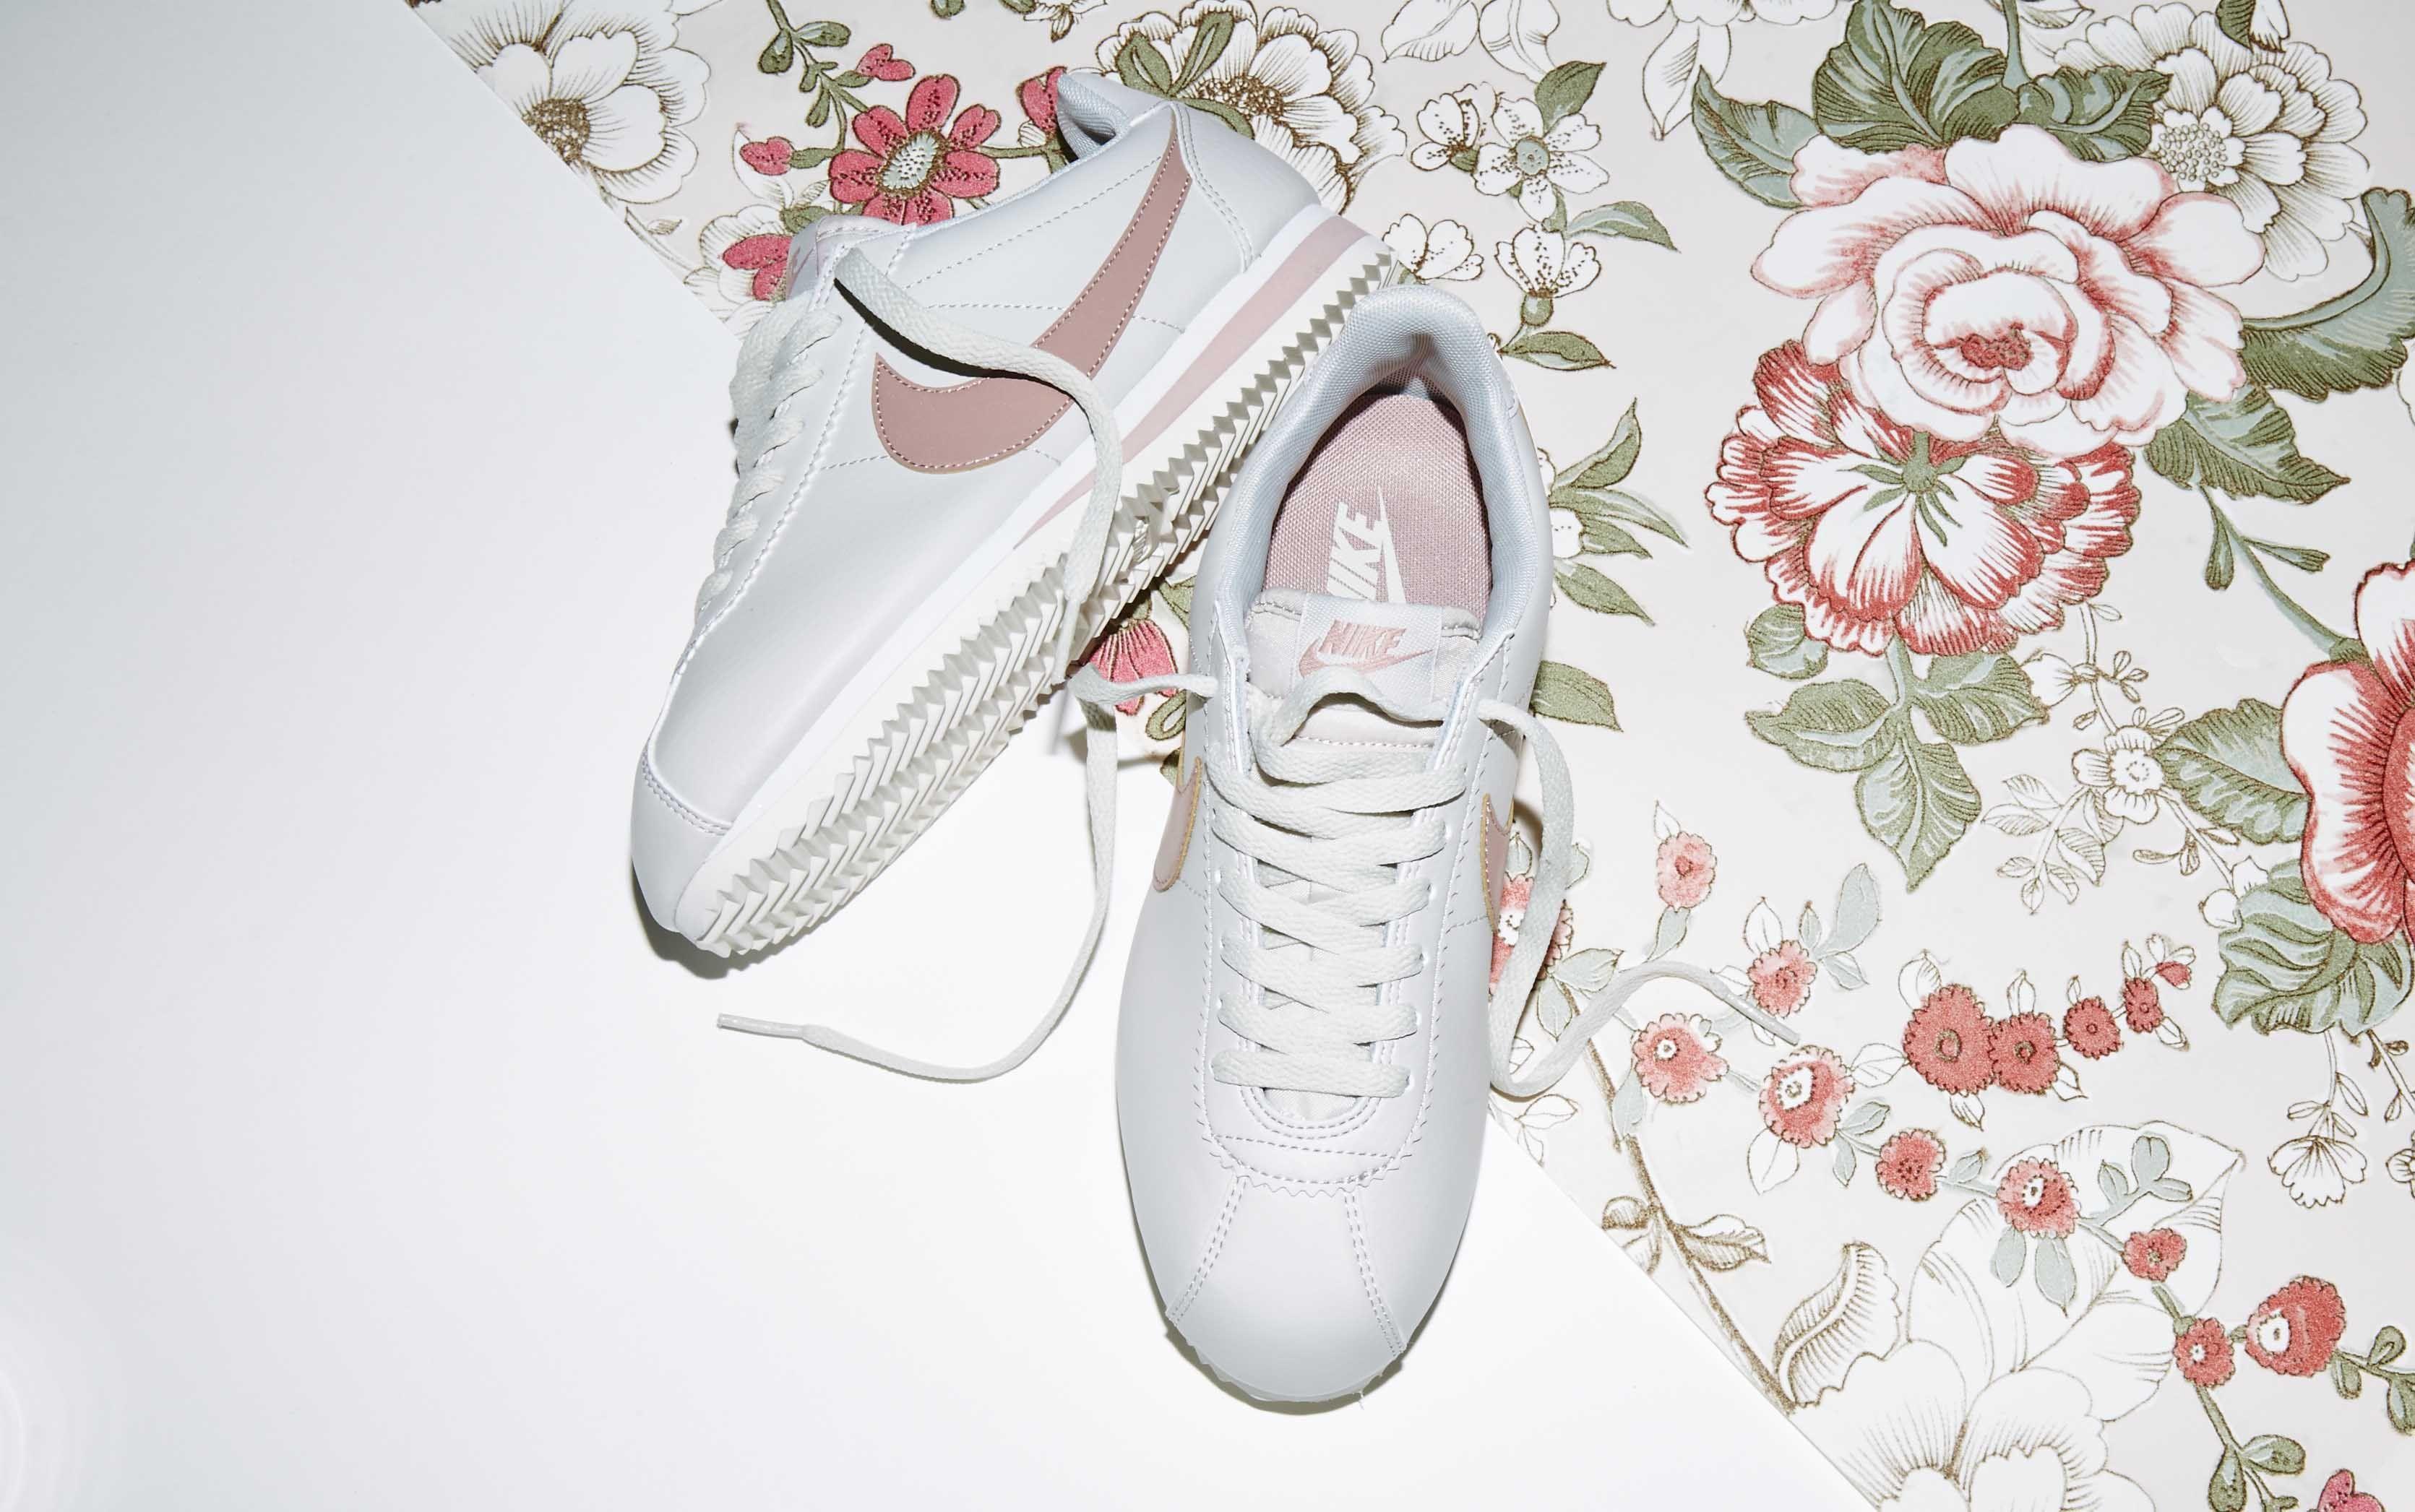 buy popular 3df46 11e3b Nike Classic Cortez Og Light Bone Particle Pink £64.99 ...